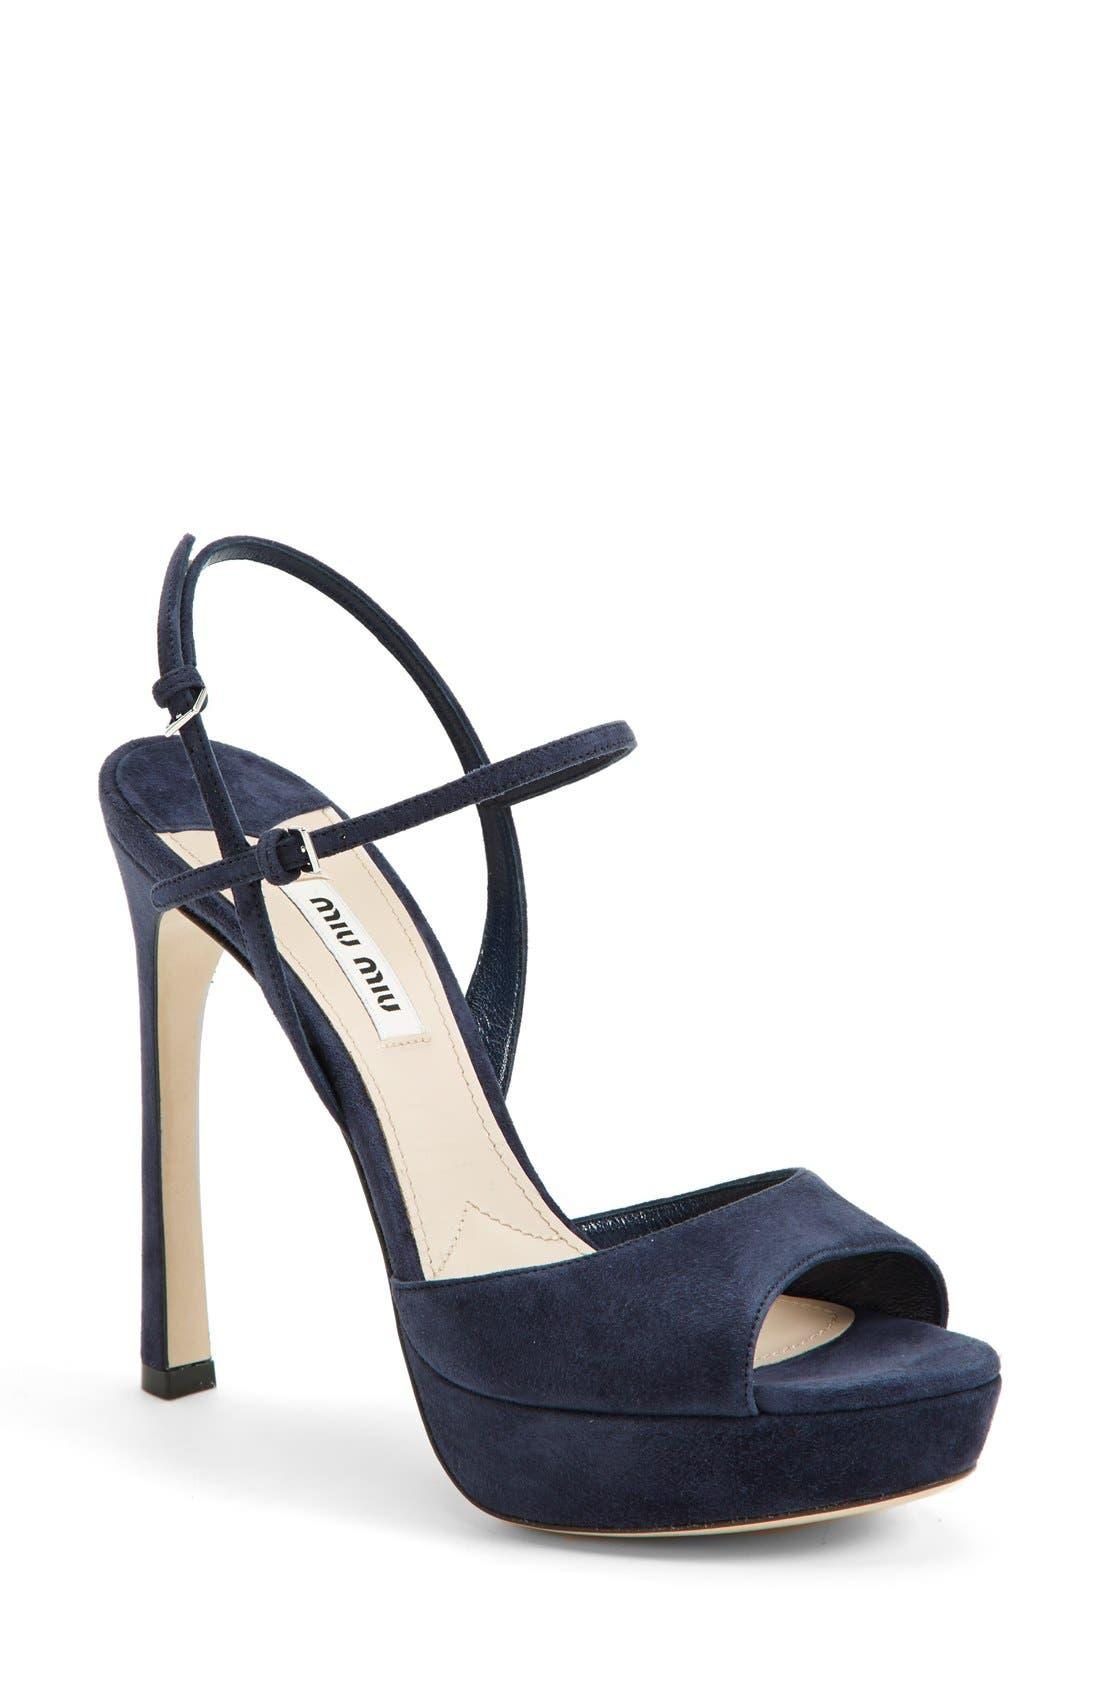 Main Image - Miu Miu Platform Sandal (Women)